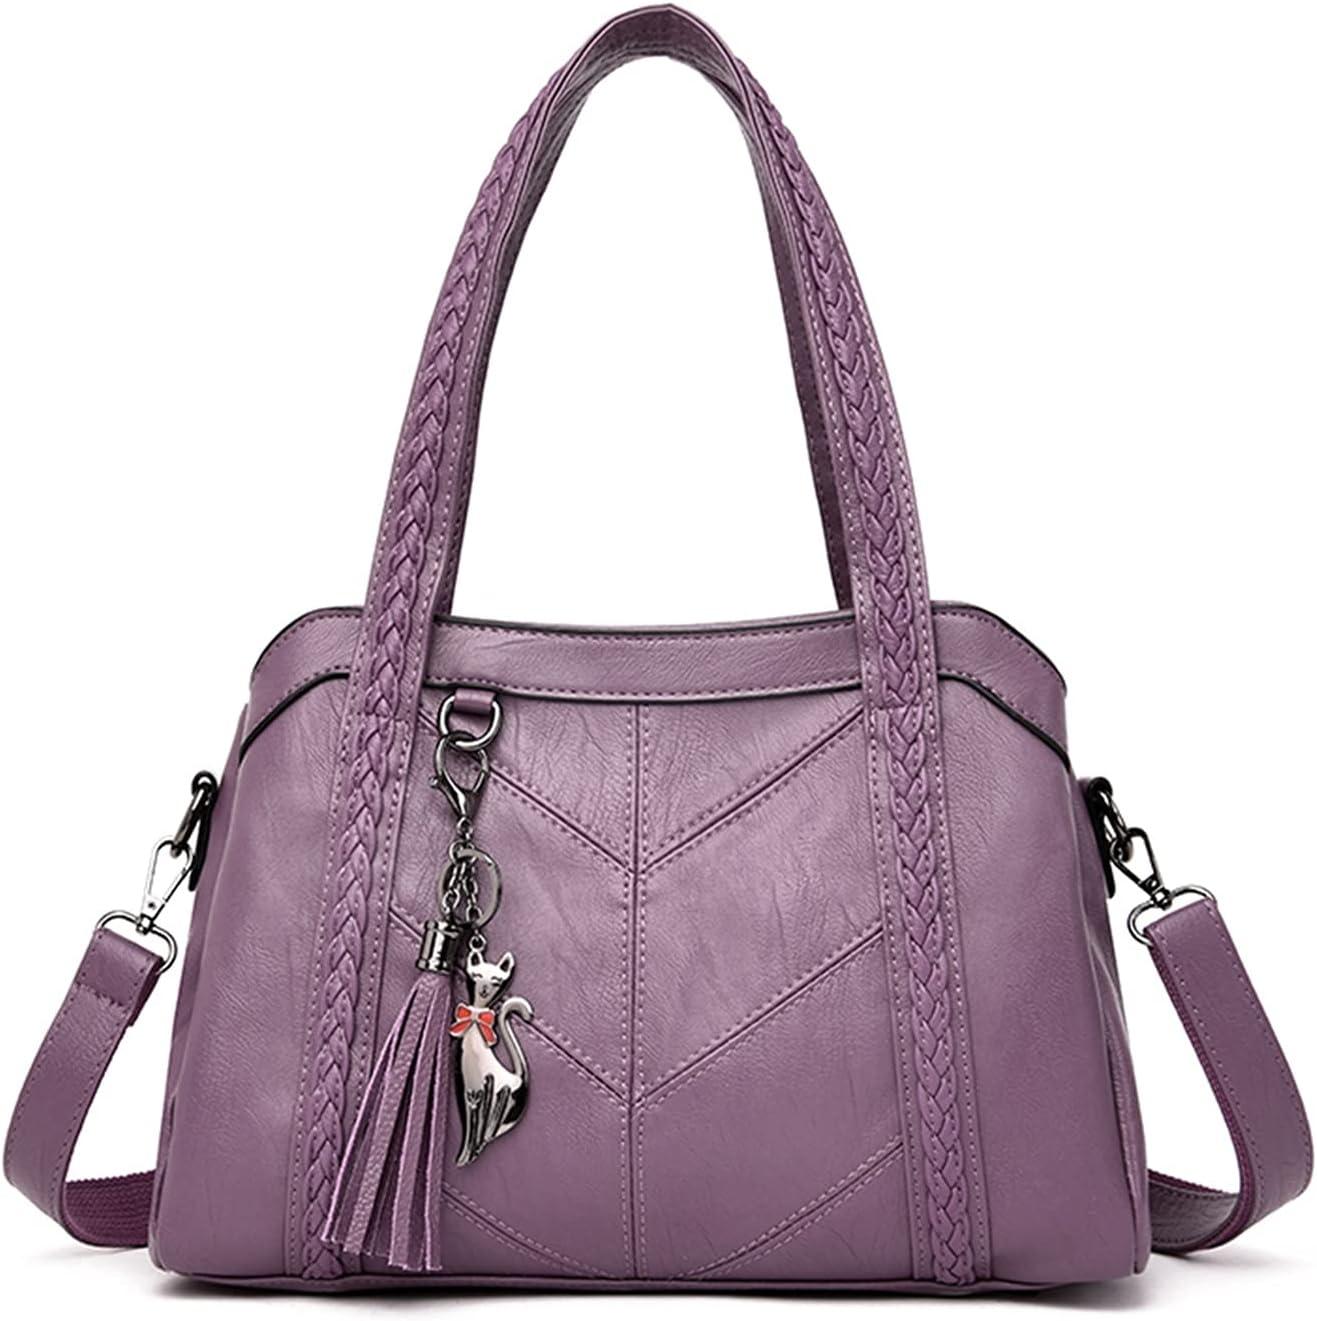 Ranking TOP6 Women Handbags Shoulder Bags Super sale period limited Genuine Crossbody Leather Ba Female